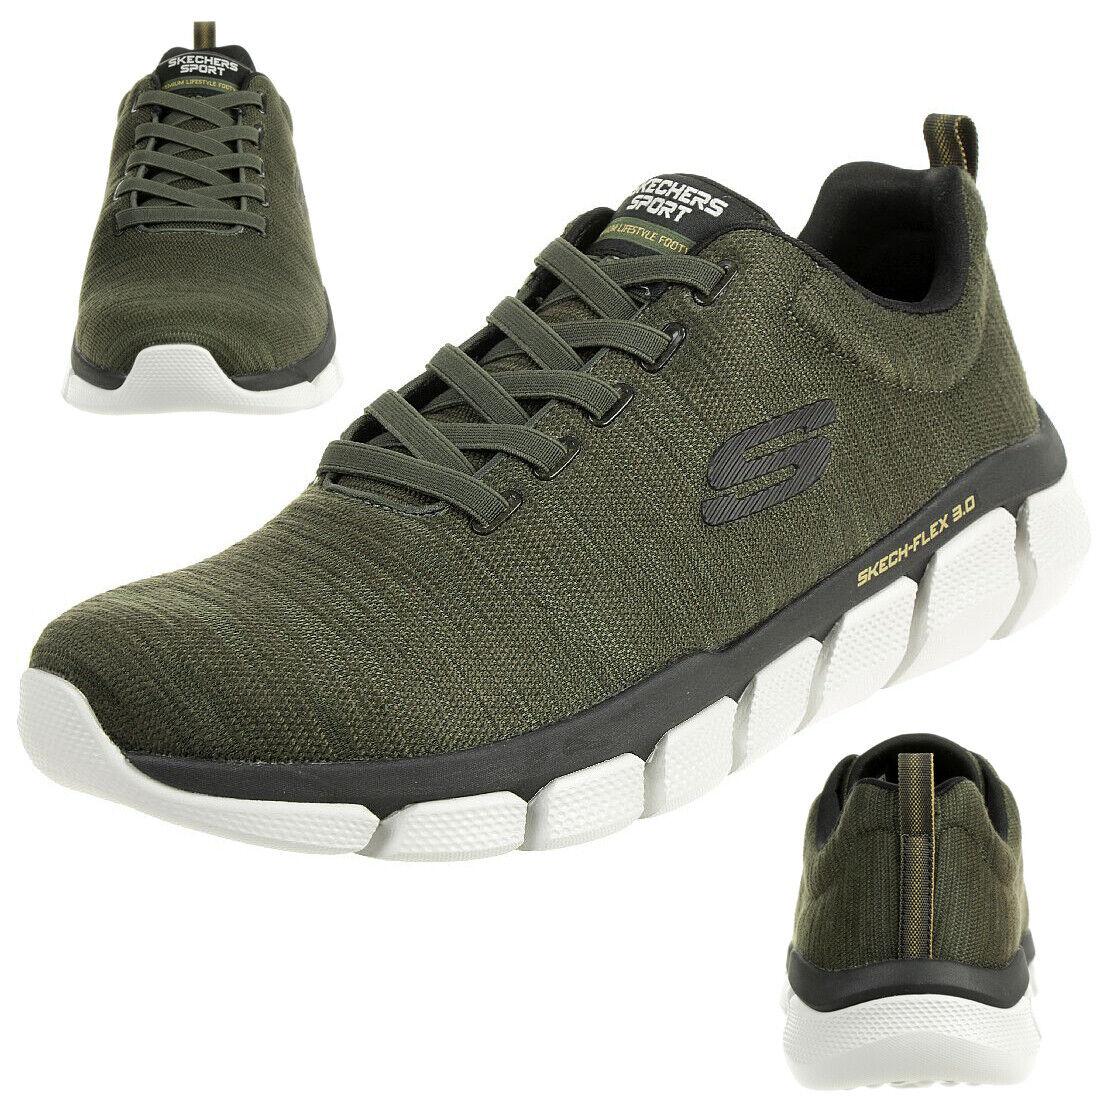 Skechers Skech Flex 3.0 Strongkeep Men's Sneakers Fitness shoes Green